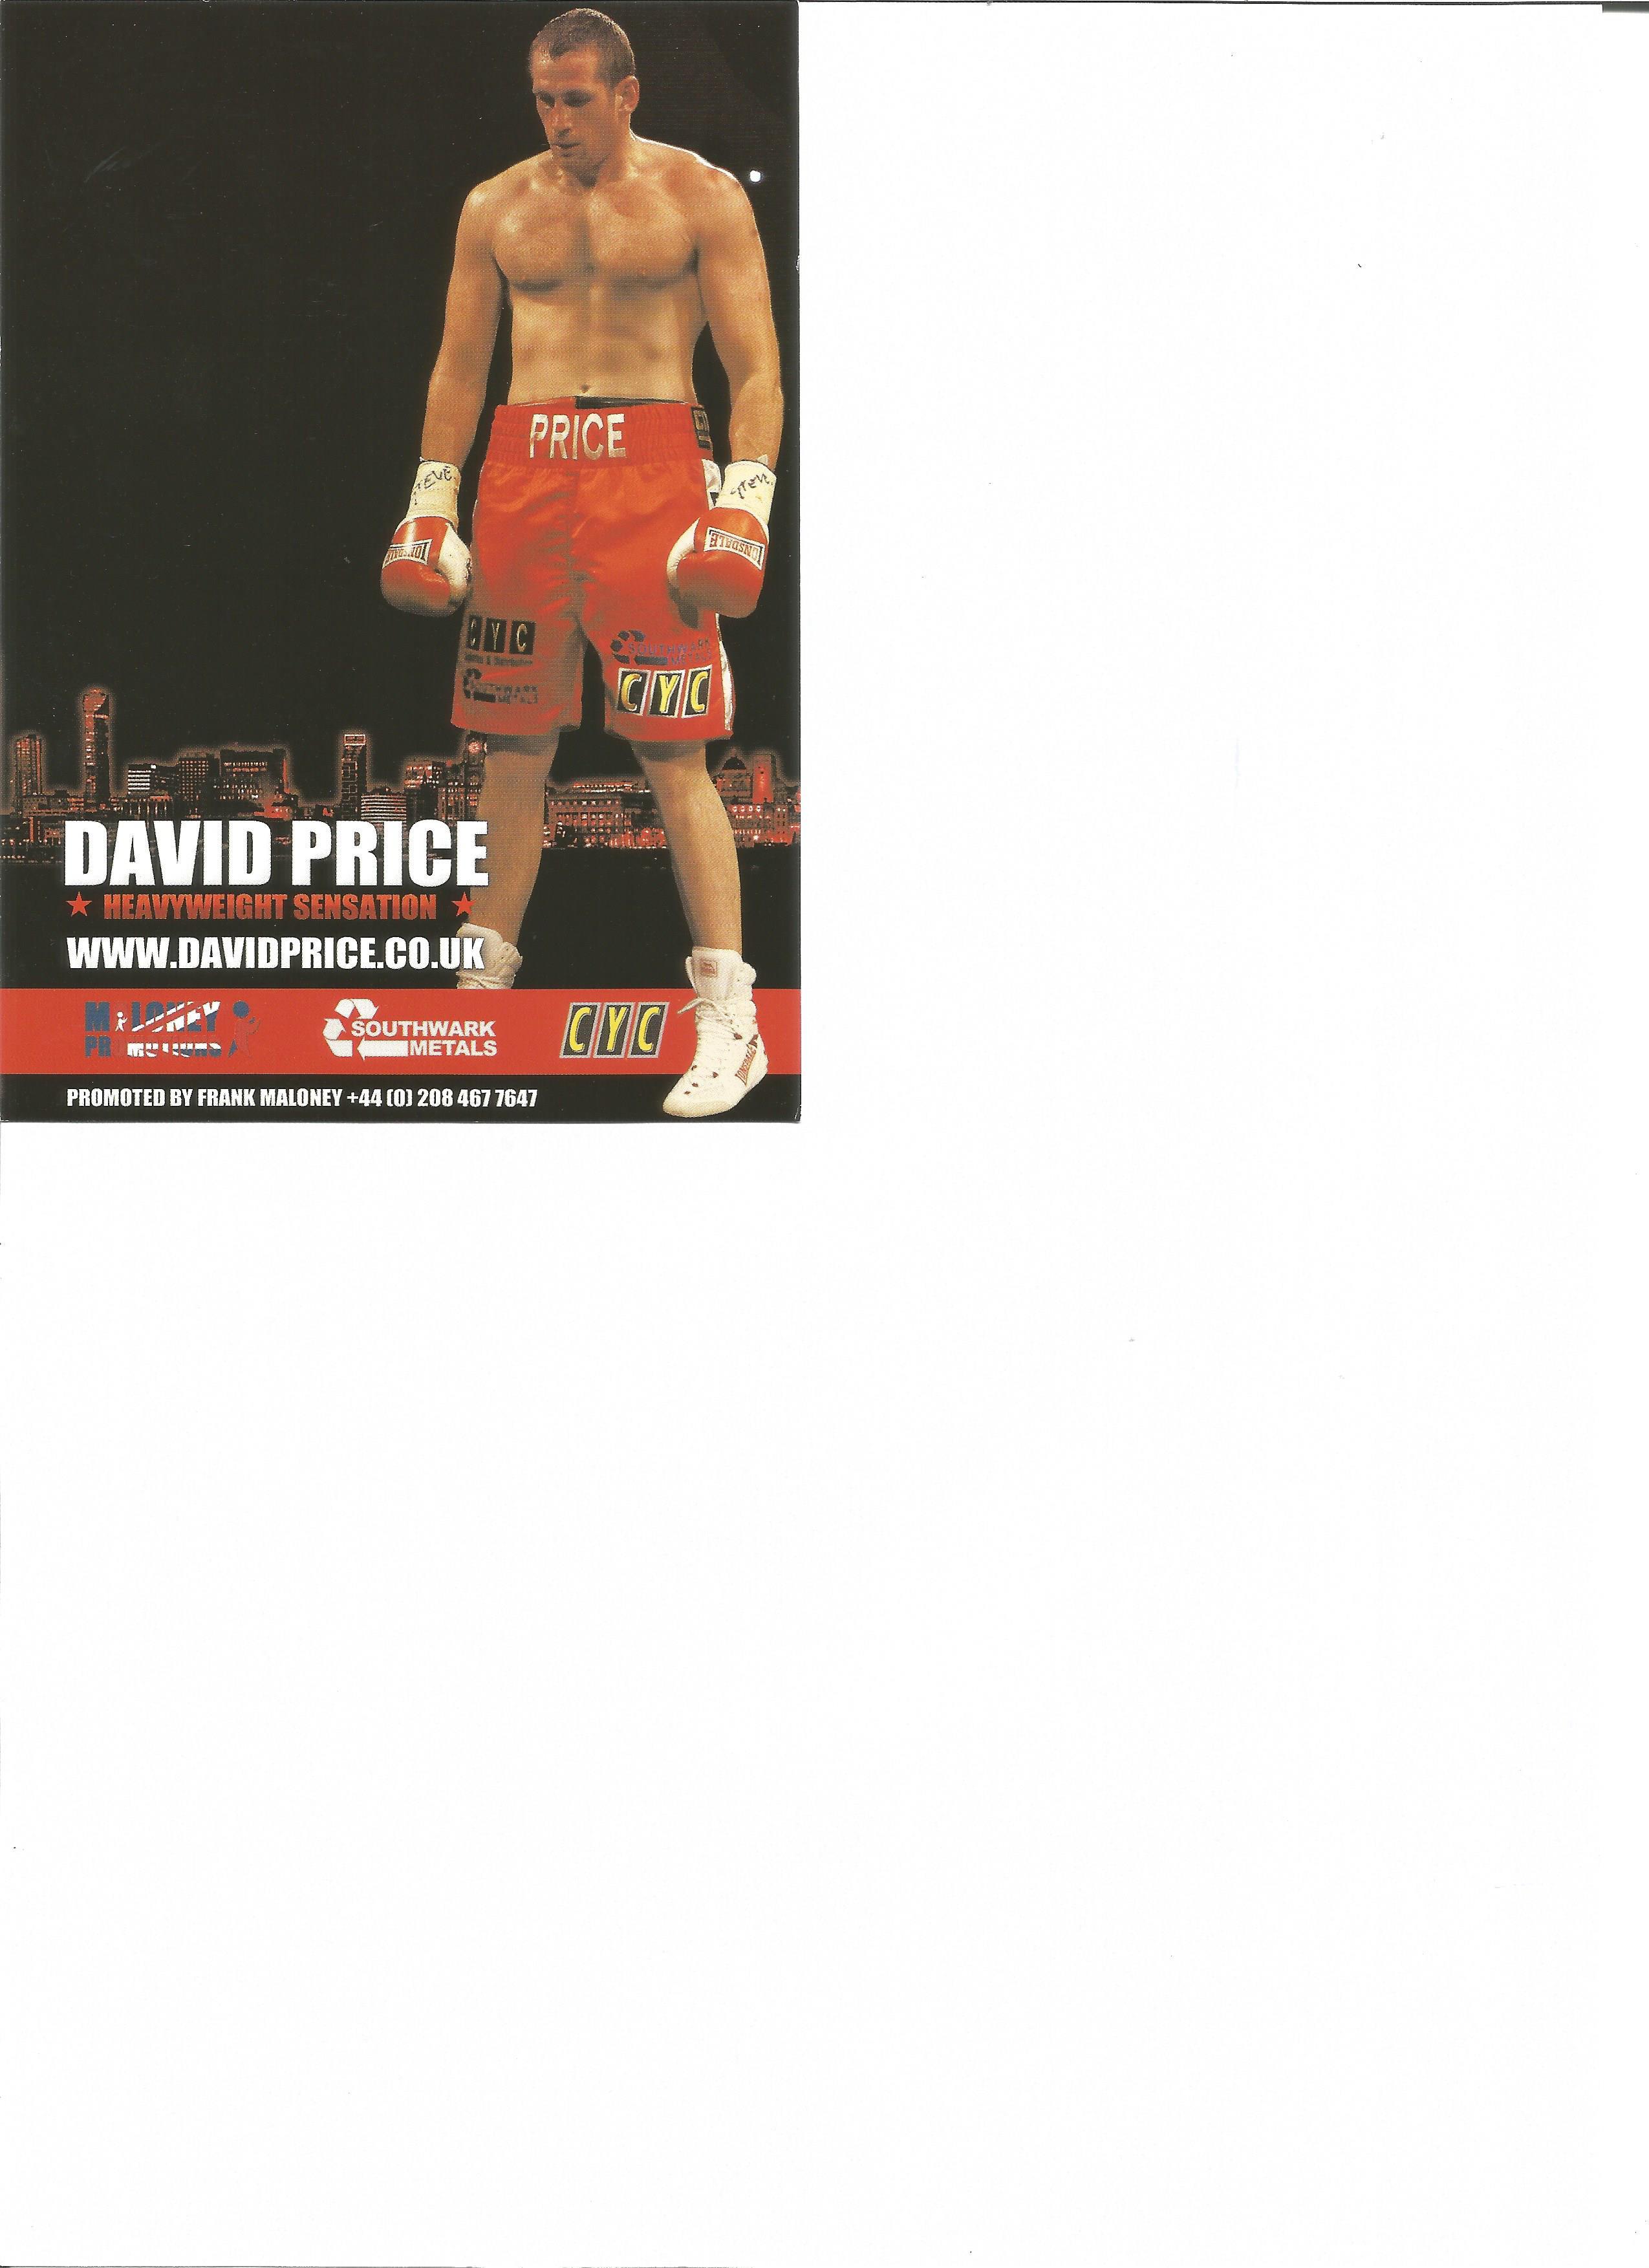 Lot 792 - Boxing David Price signed 6 x 4 inch promo card. David Price born 6 July 1983 is a British